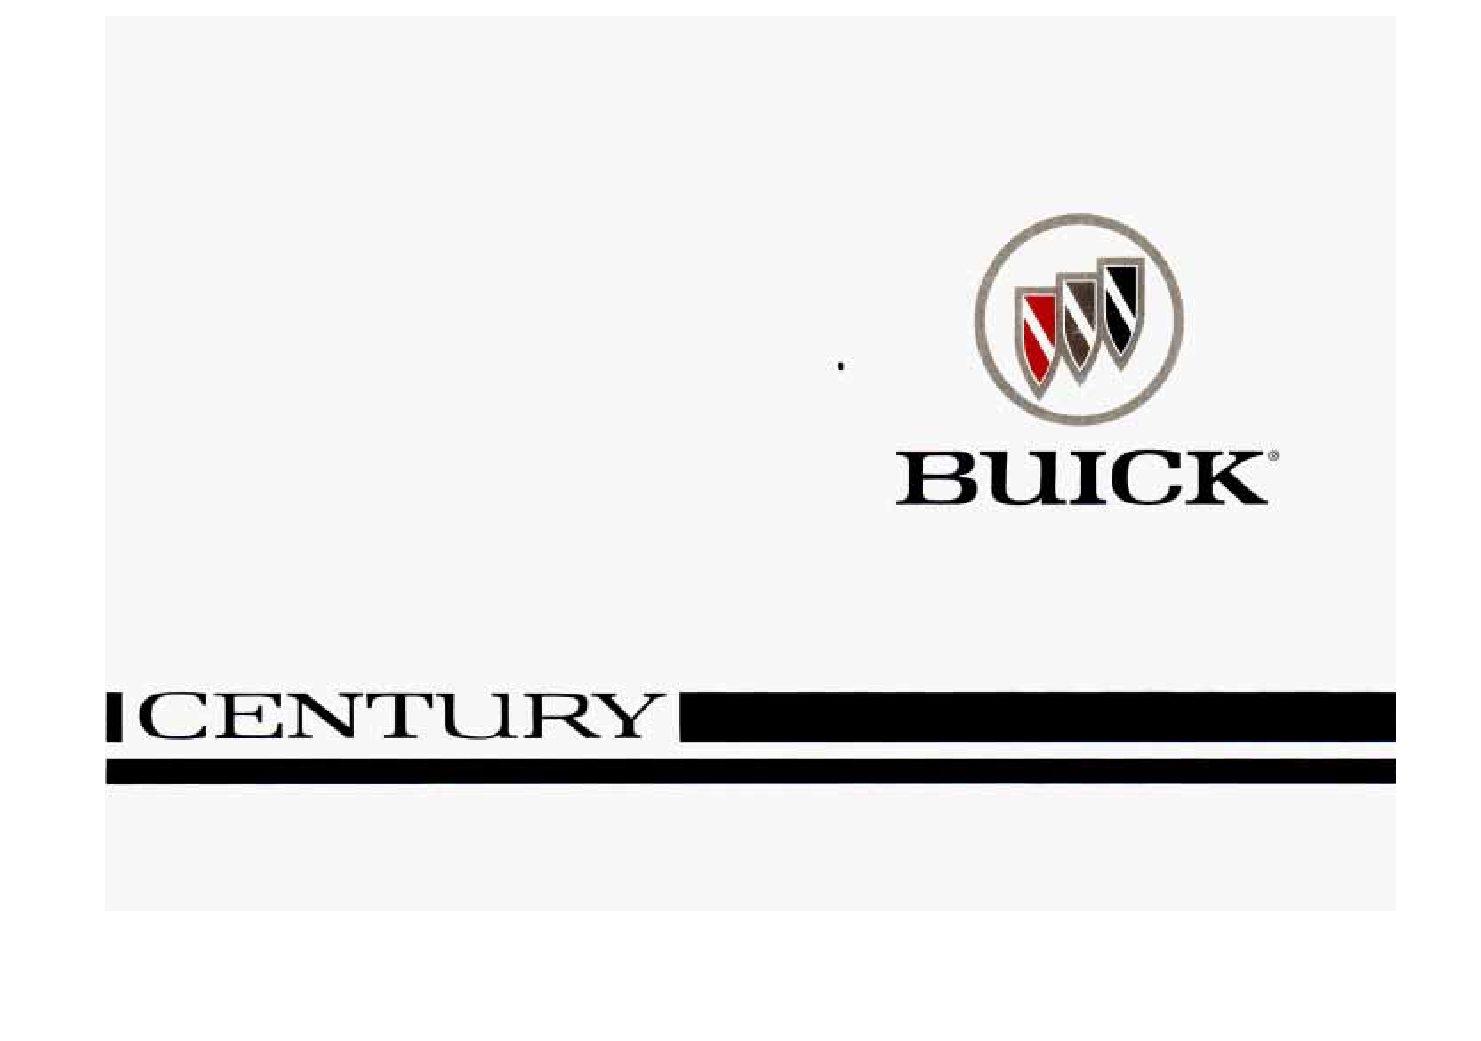 1996 buick century owners manual just give me the damn manual rh justgivemethedamnmanual com 1995 Buick Century 1994 Buick Century